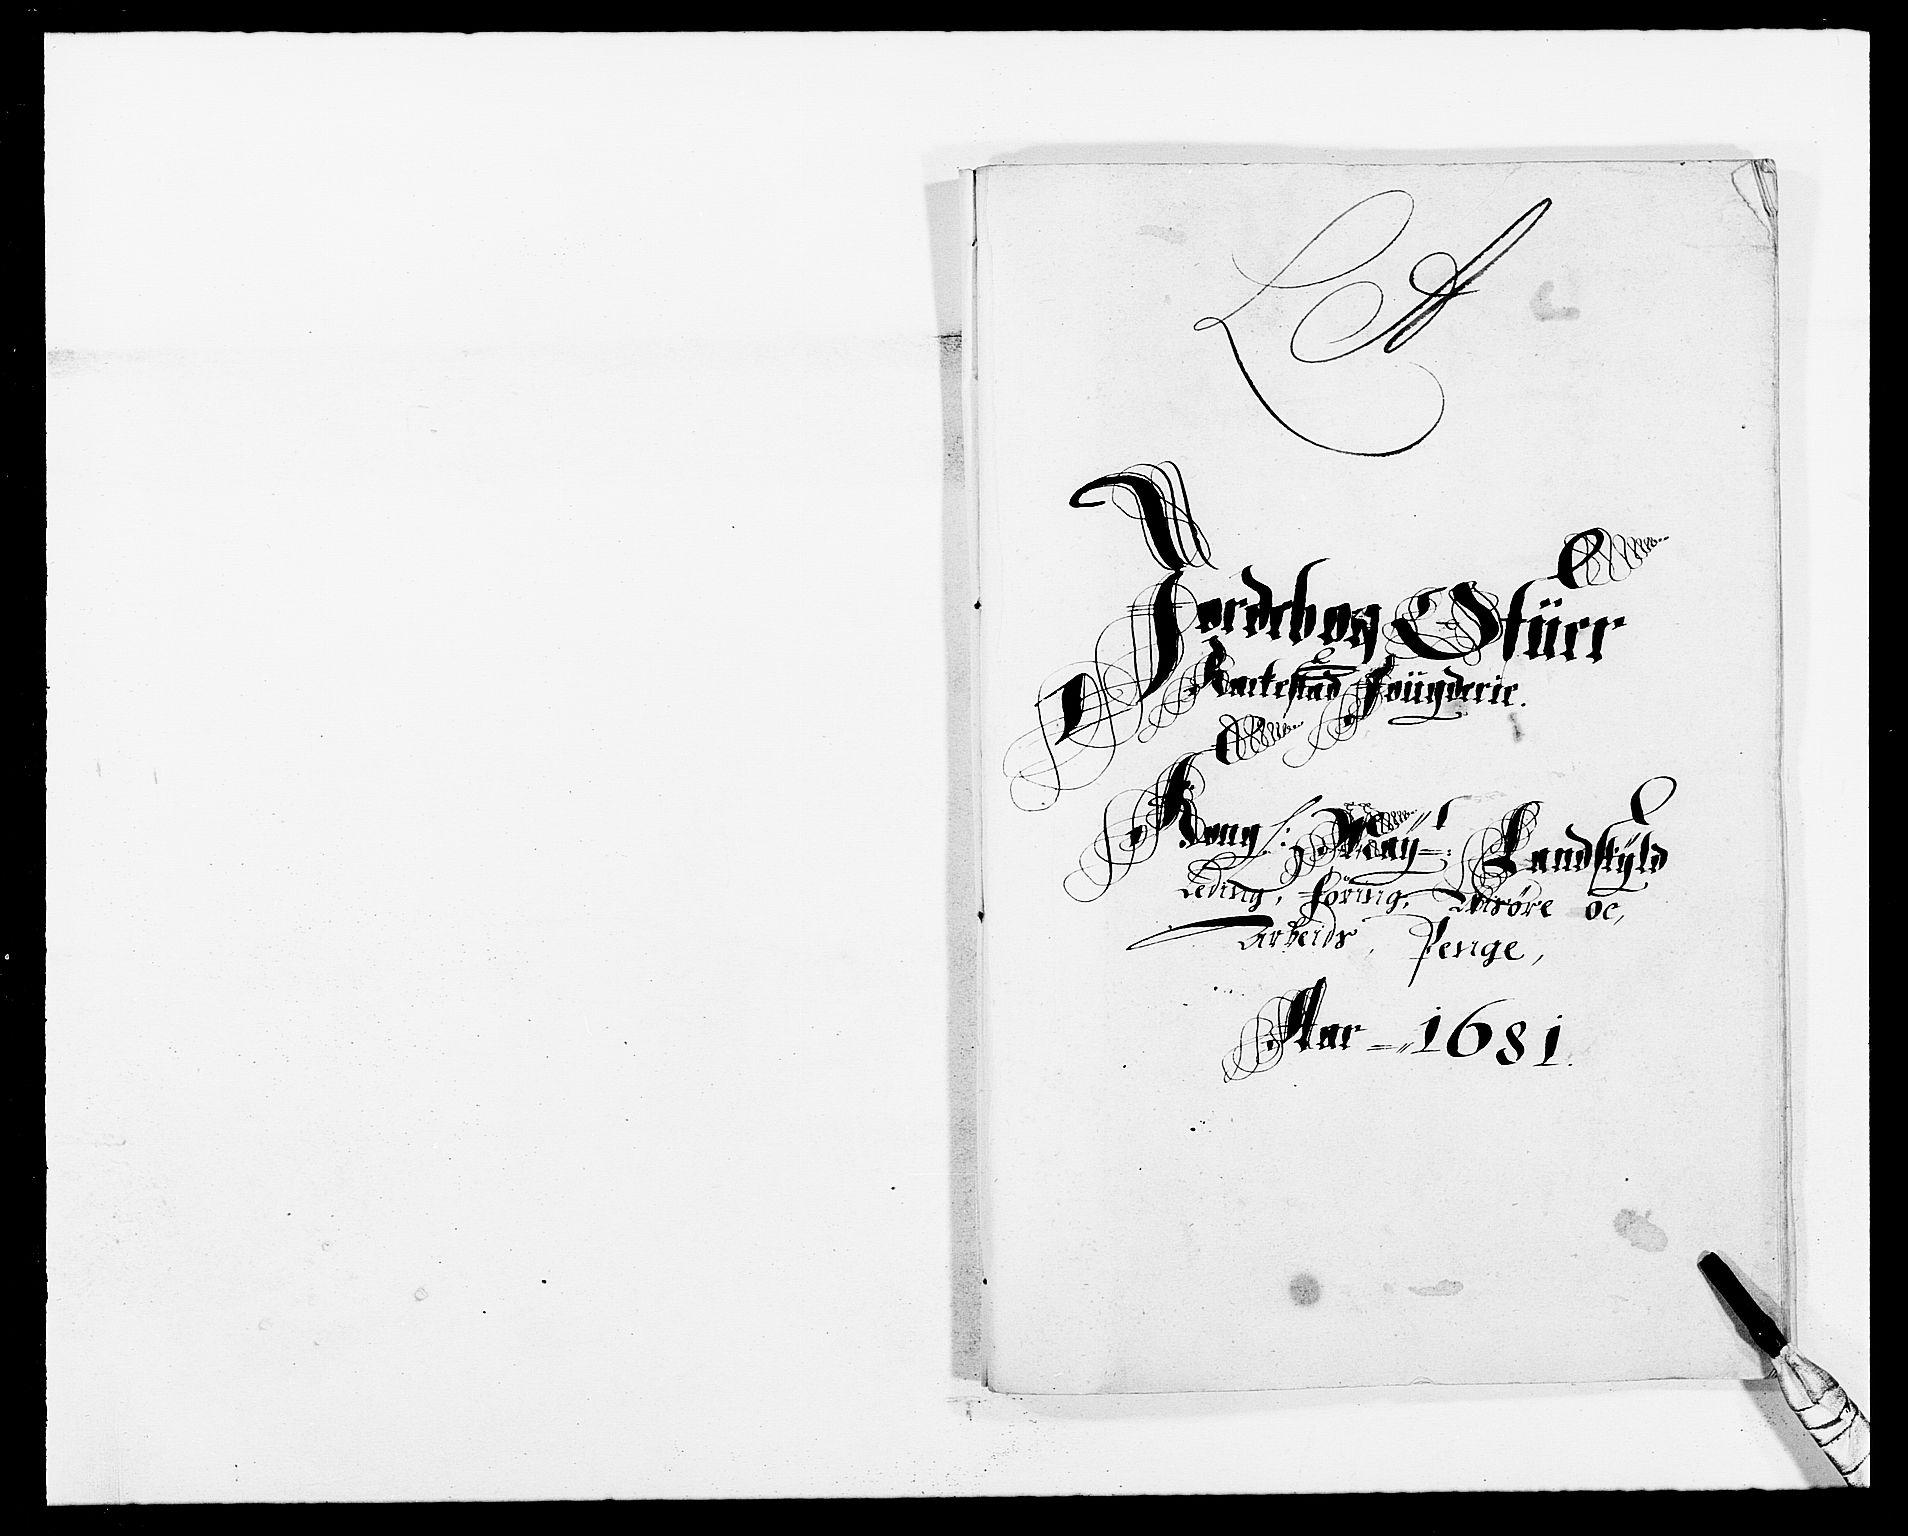 RA, Rentekammeret inntil 1814, Reviderte regnskaper, Fogderegnskap, R05/L0272: Fogderegnskap Rakkestad, 1680-1681, s. 211